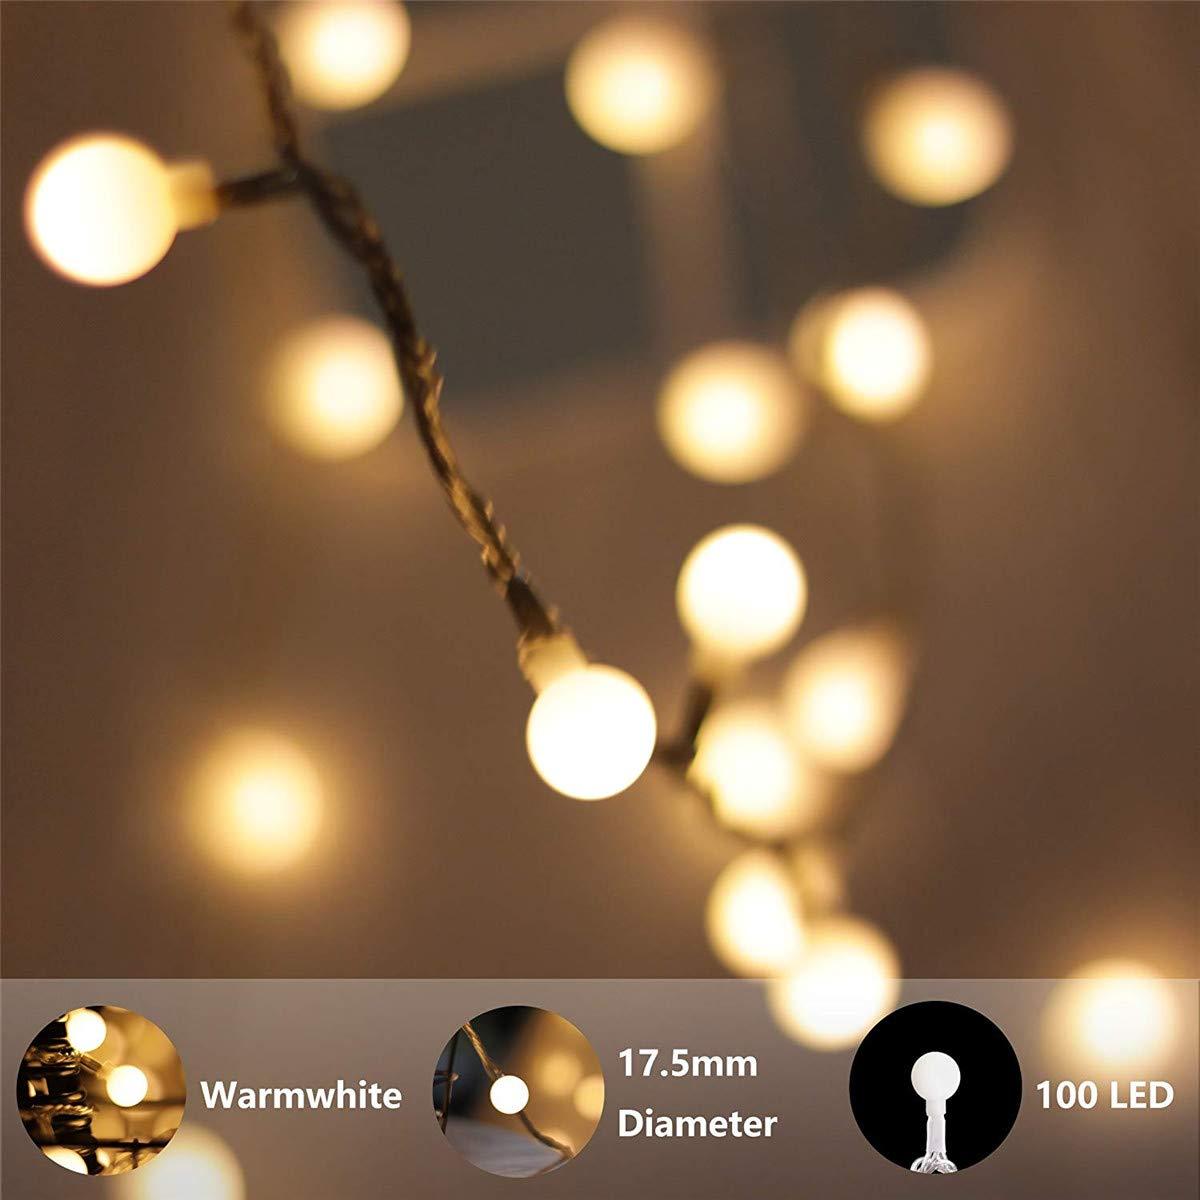 MUMUWU - Guirnalda de Luces LED (100 ledes, 10 m, 220 V, Impermeable): Amazon.es: Hogar